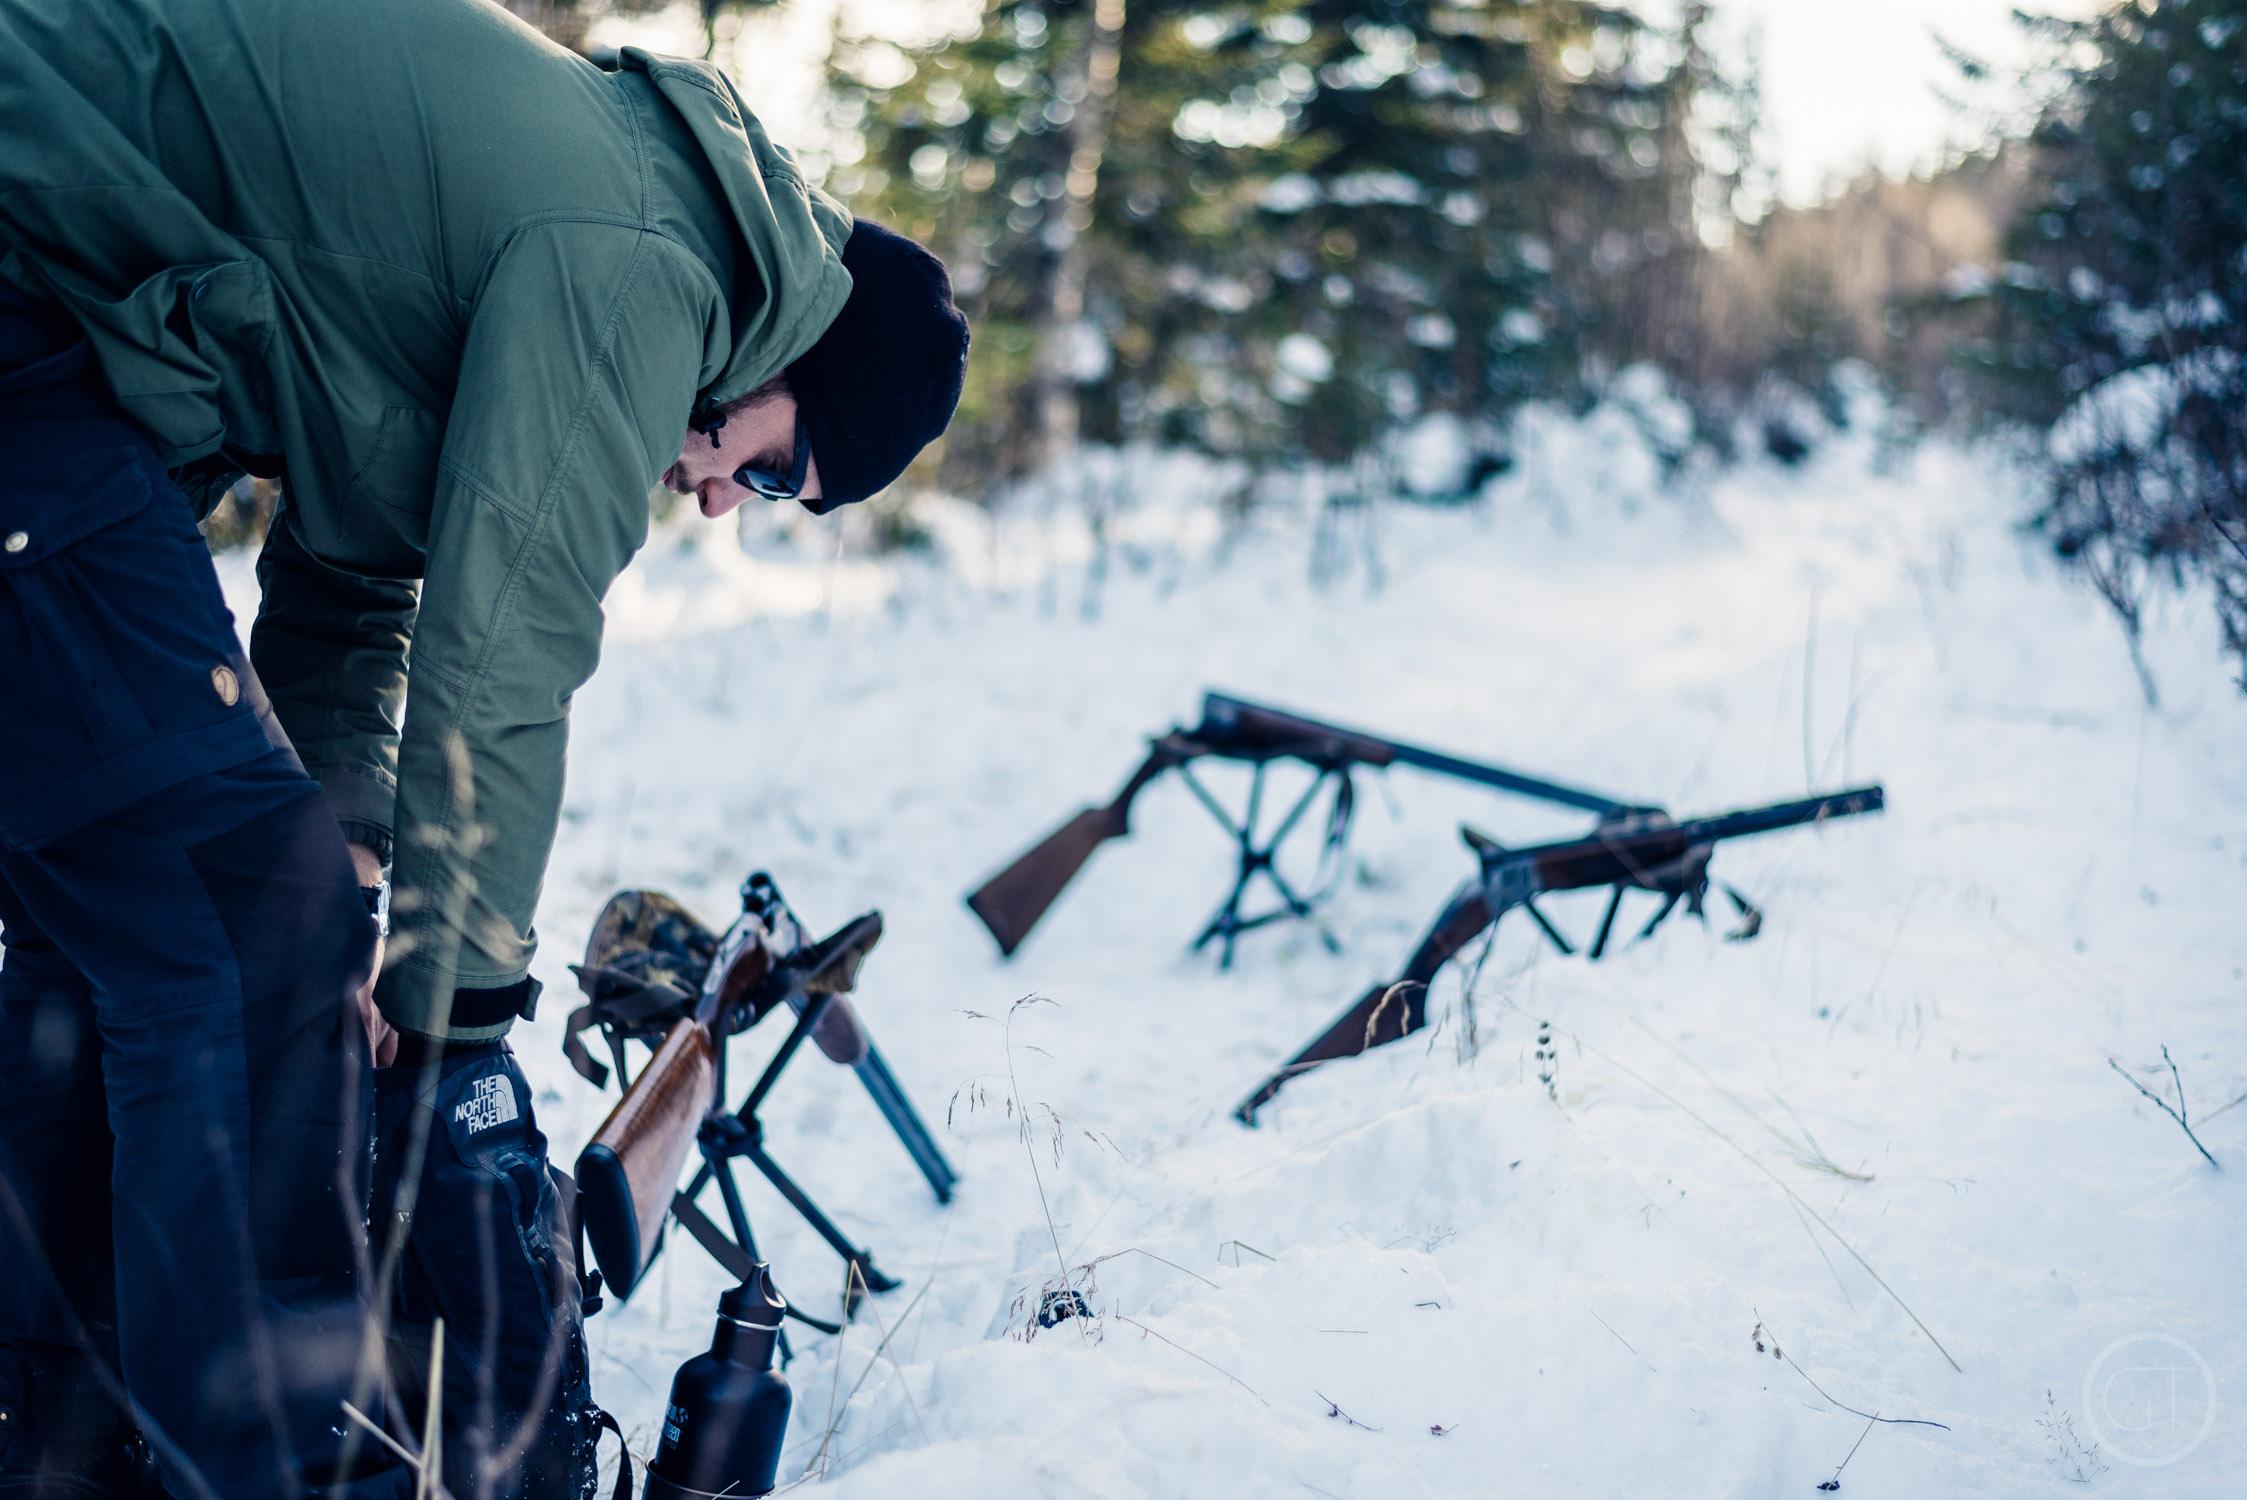 GUSTAV_THUESEN_HUNTING_NORWAY_OUTDOOR_LIFESTYLE_PHOTOGRAPHER_PROFESSIONAL-2.jpg